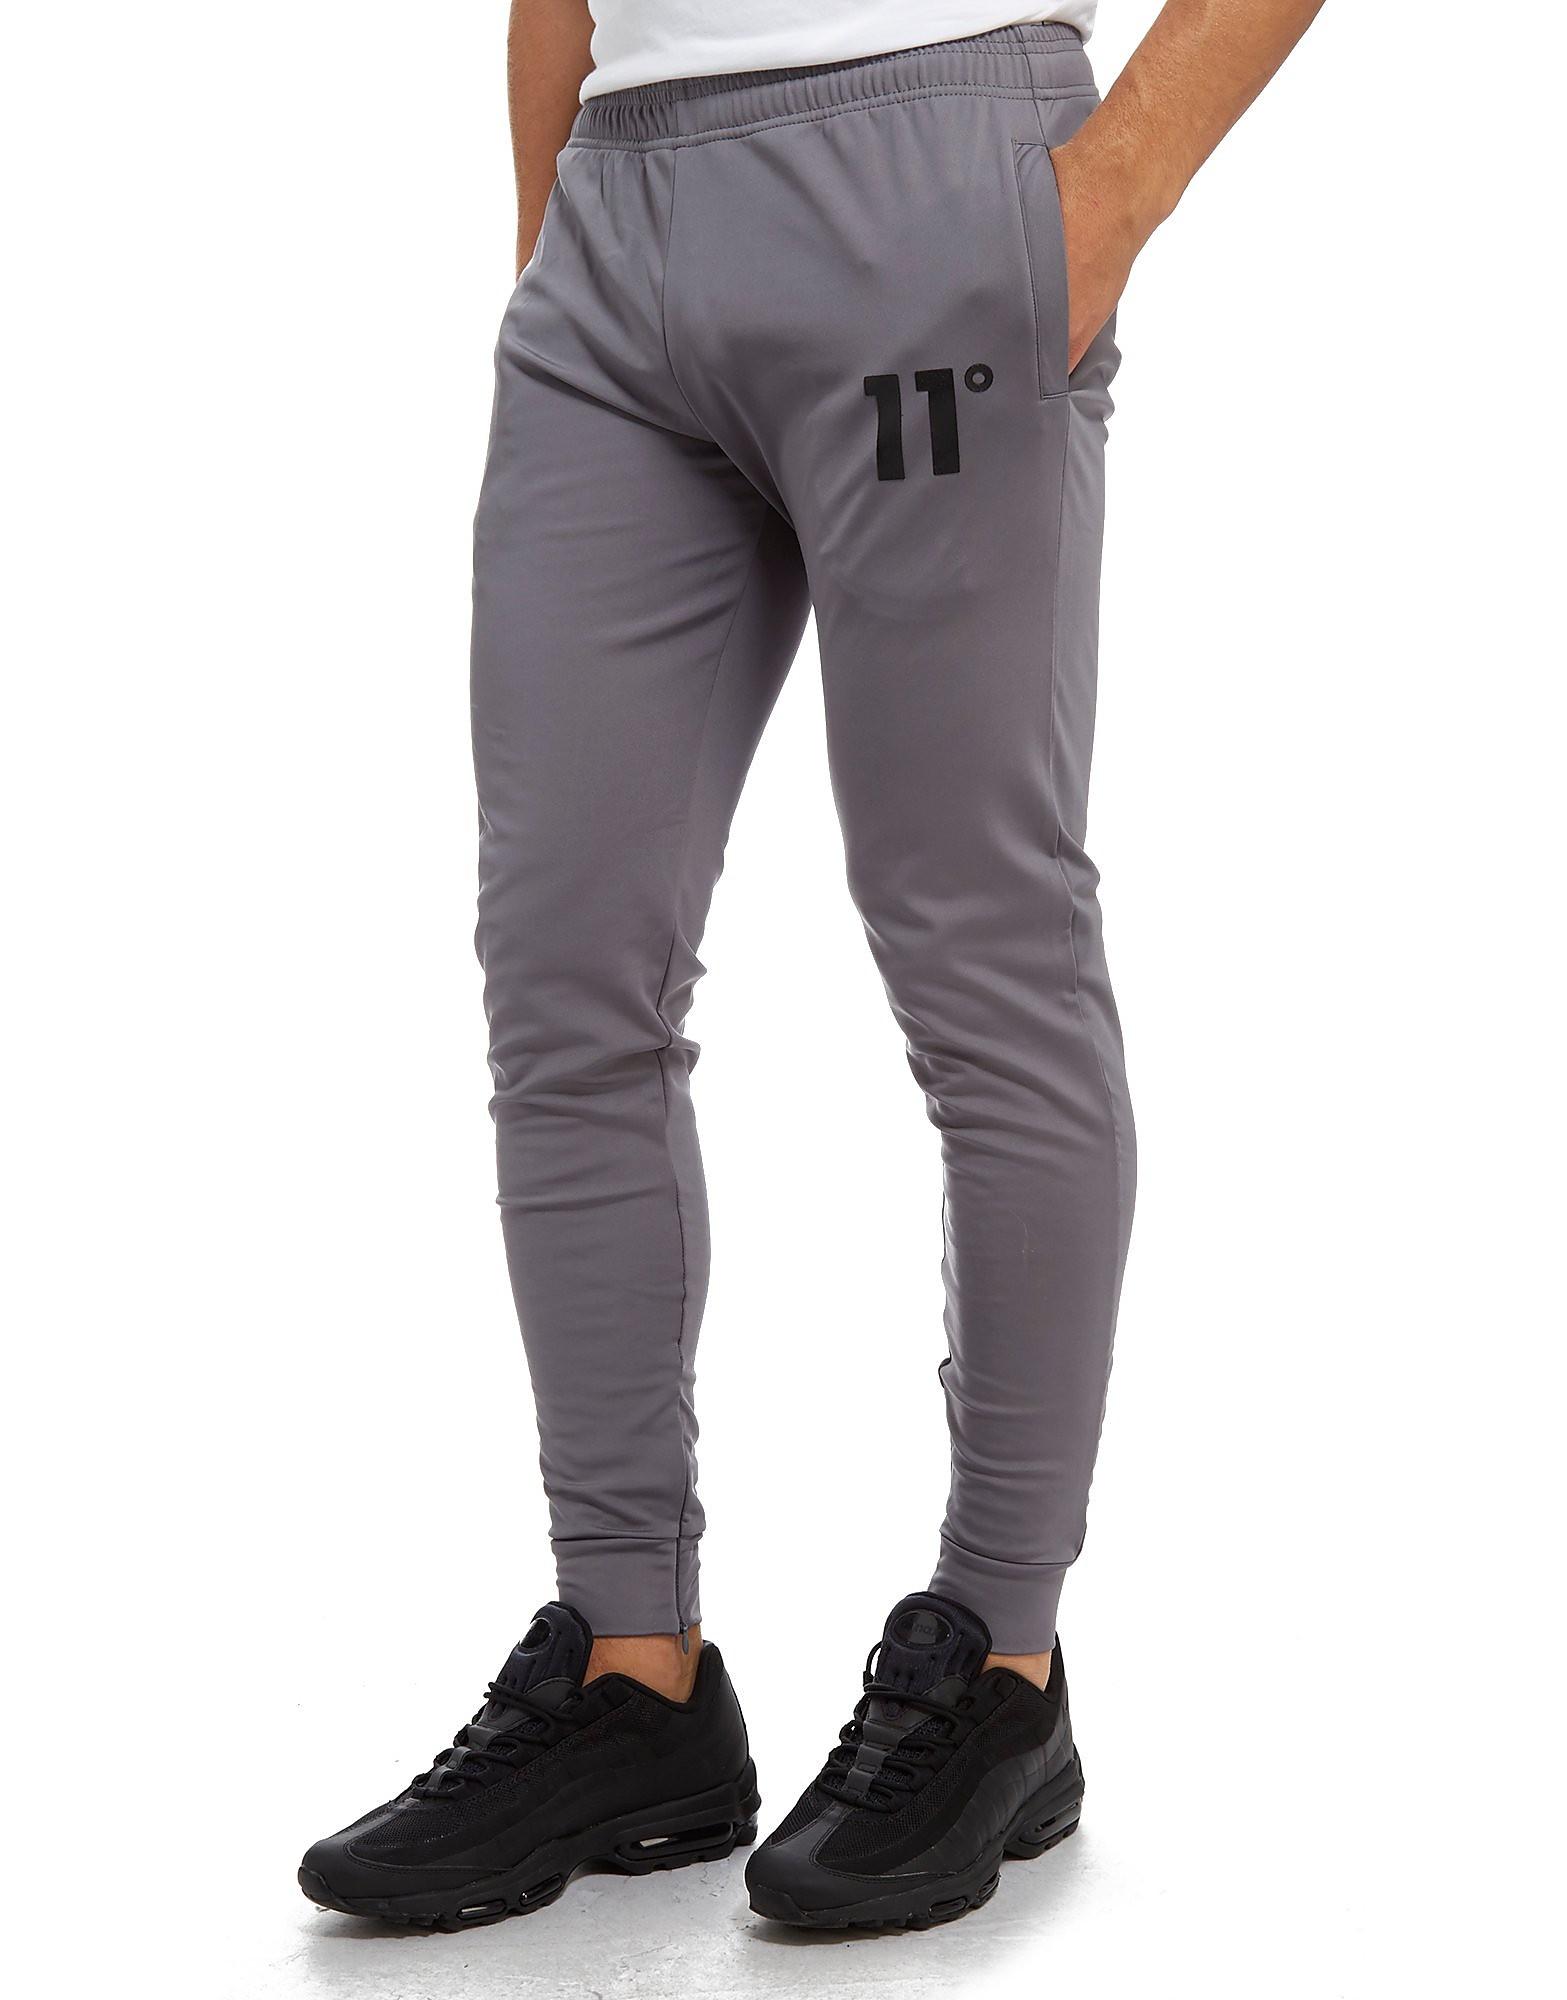 11 Degrees Core Poly Pants